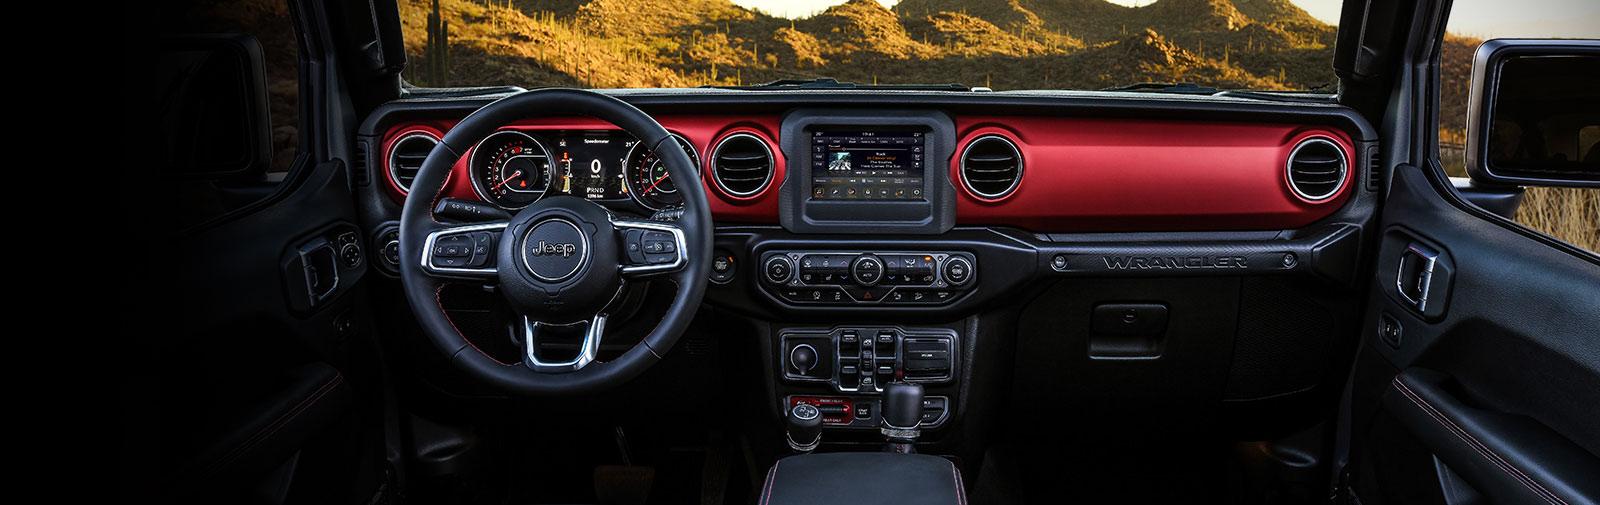 Jeep Wrangler Autozentren P&A-Preckel